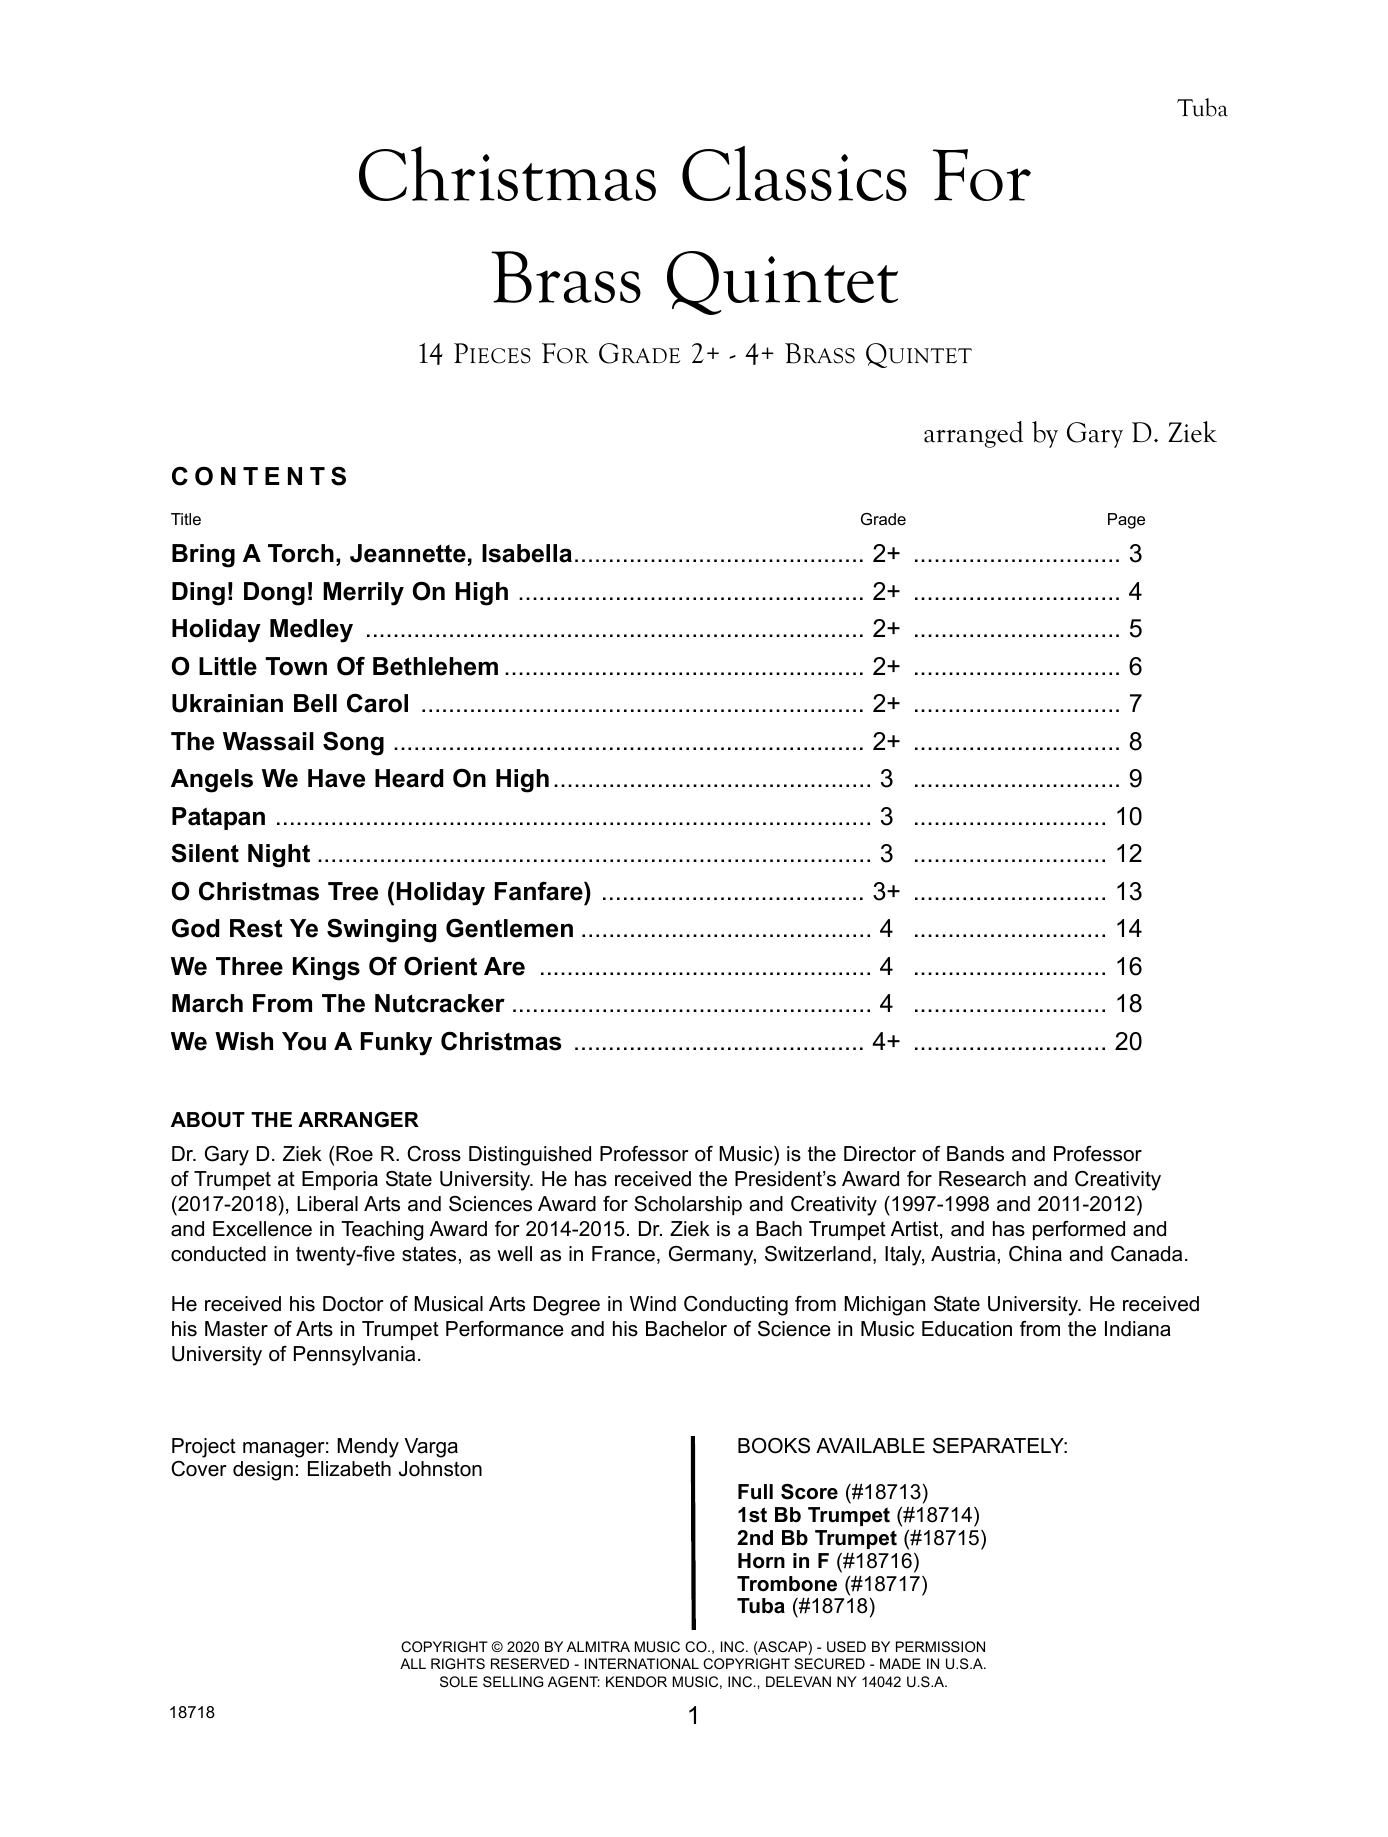 Christmas Classics For Brass Quintet - Tuba Sheet Music